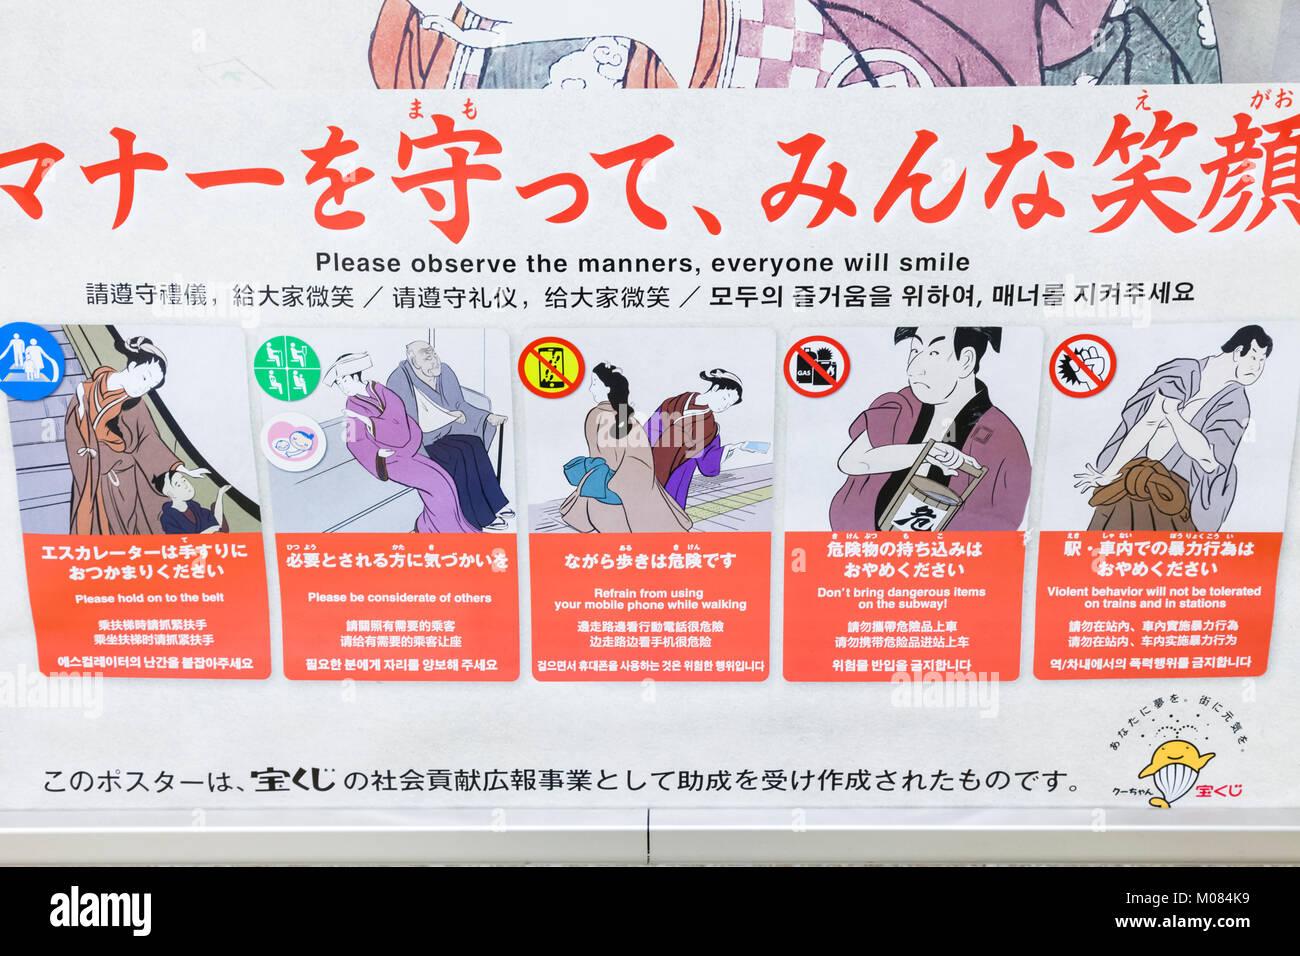 Japan, Honshu, Tokyo, Subway Passenger Politeness Education Poster - Stock Image